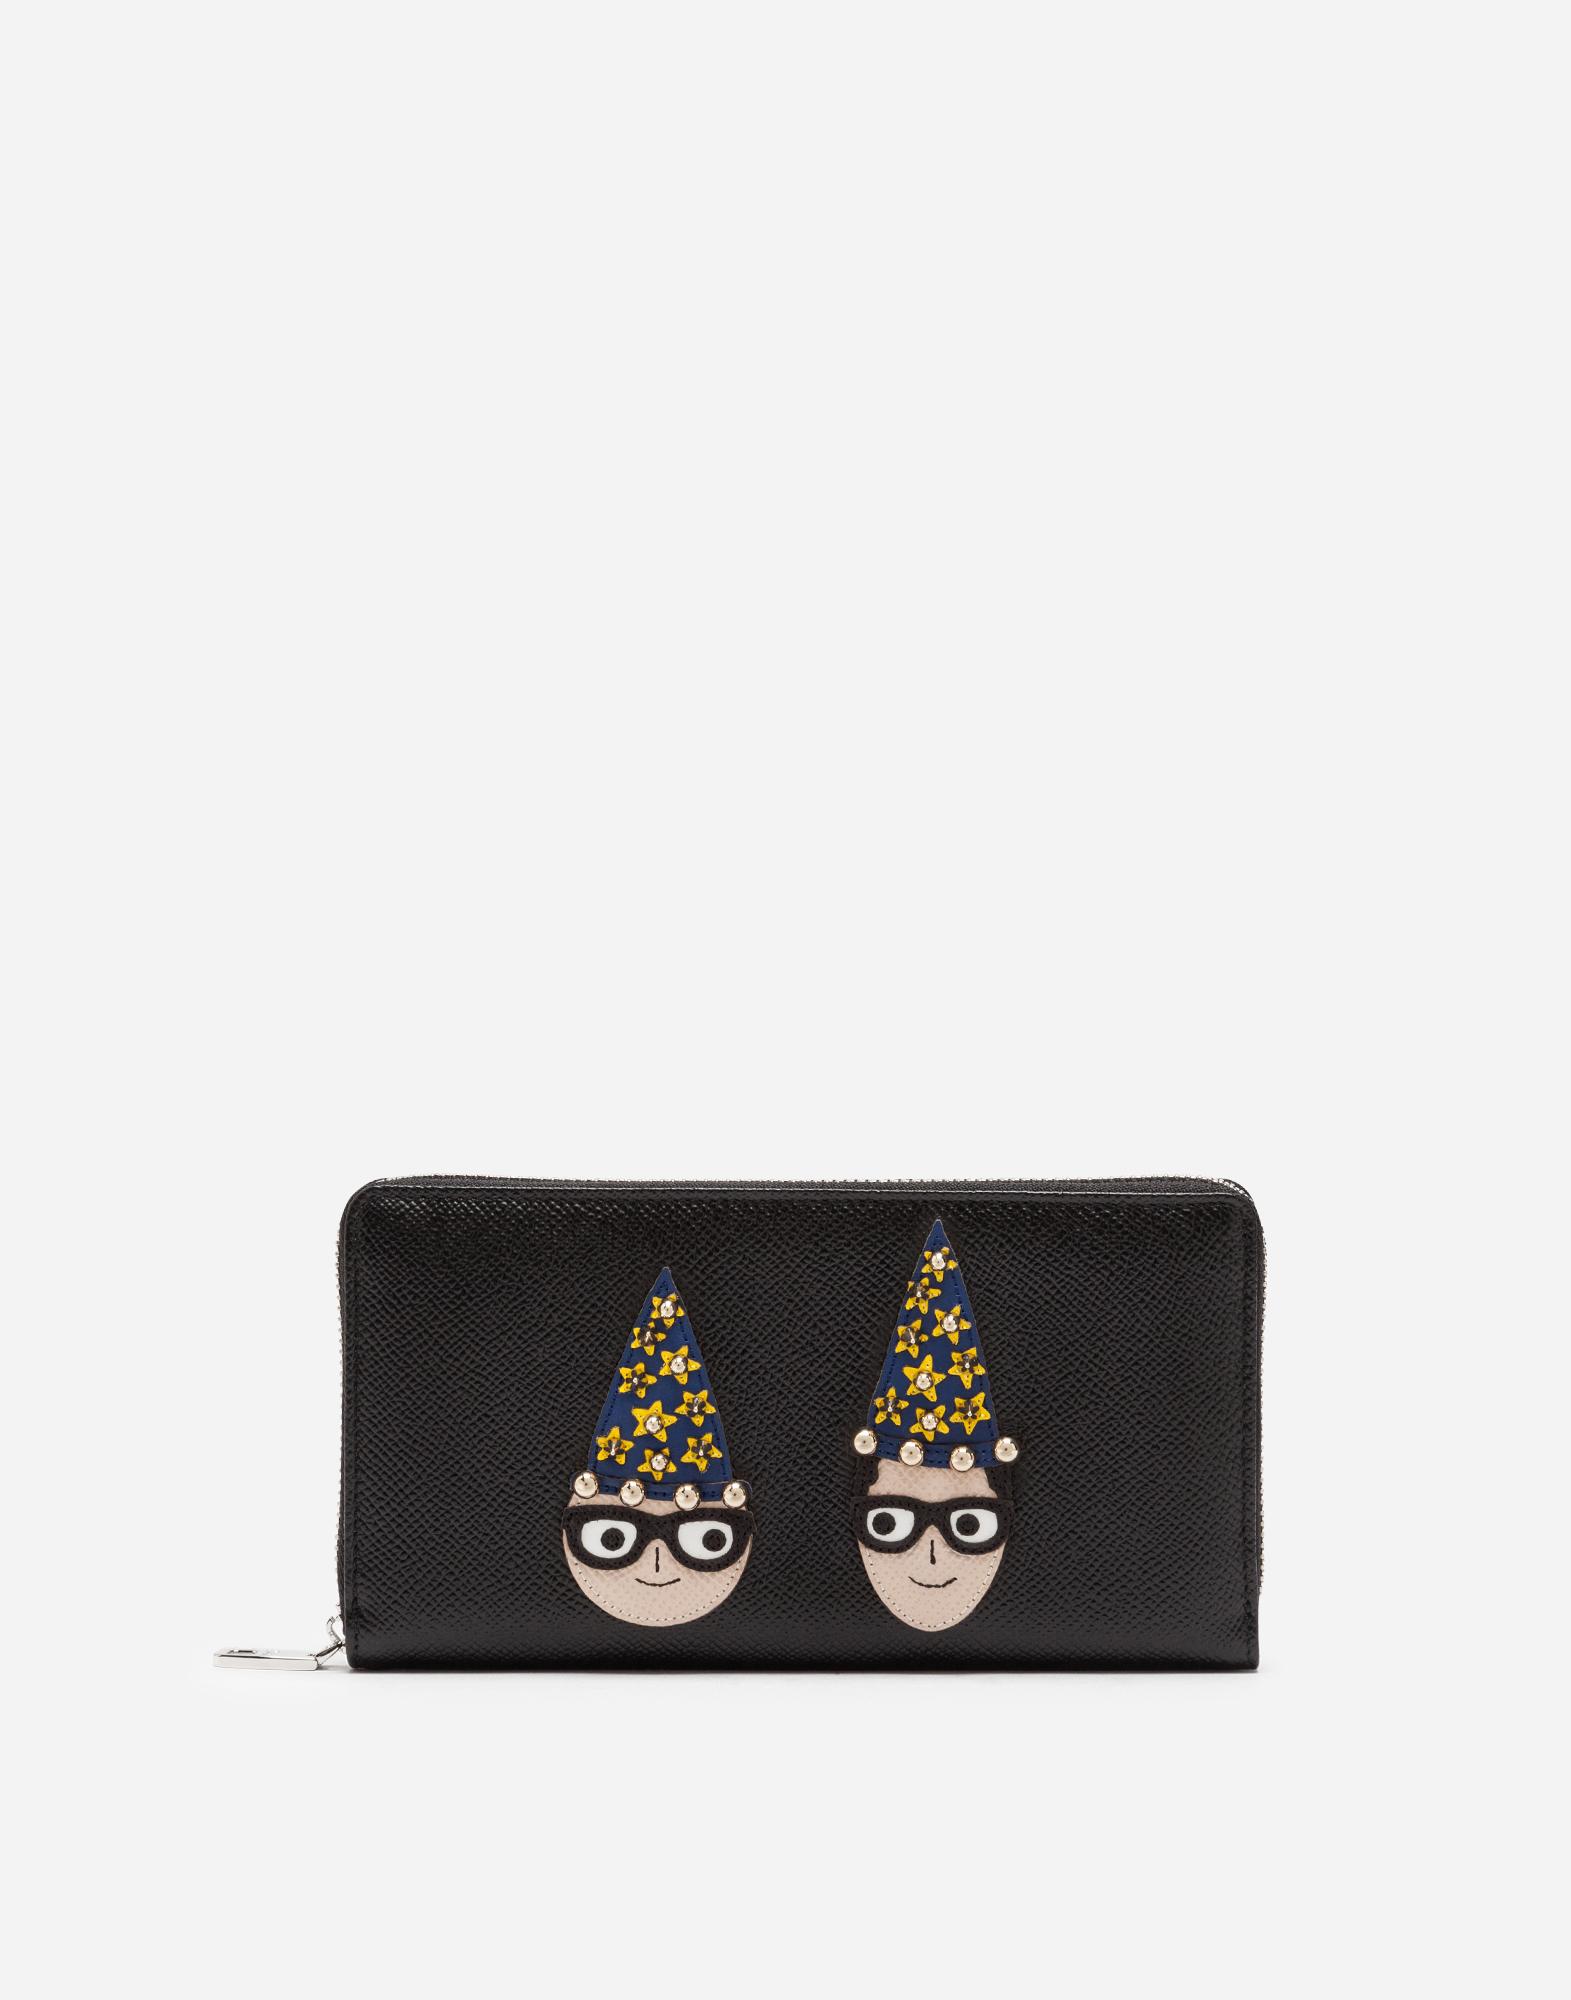 Dolce & Gabbana ZIP-AROUND WALLET IN DAUPHINE CALFSKIN WITH DESIGNERS' PATCHES